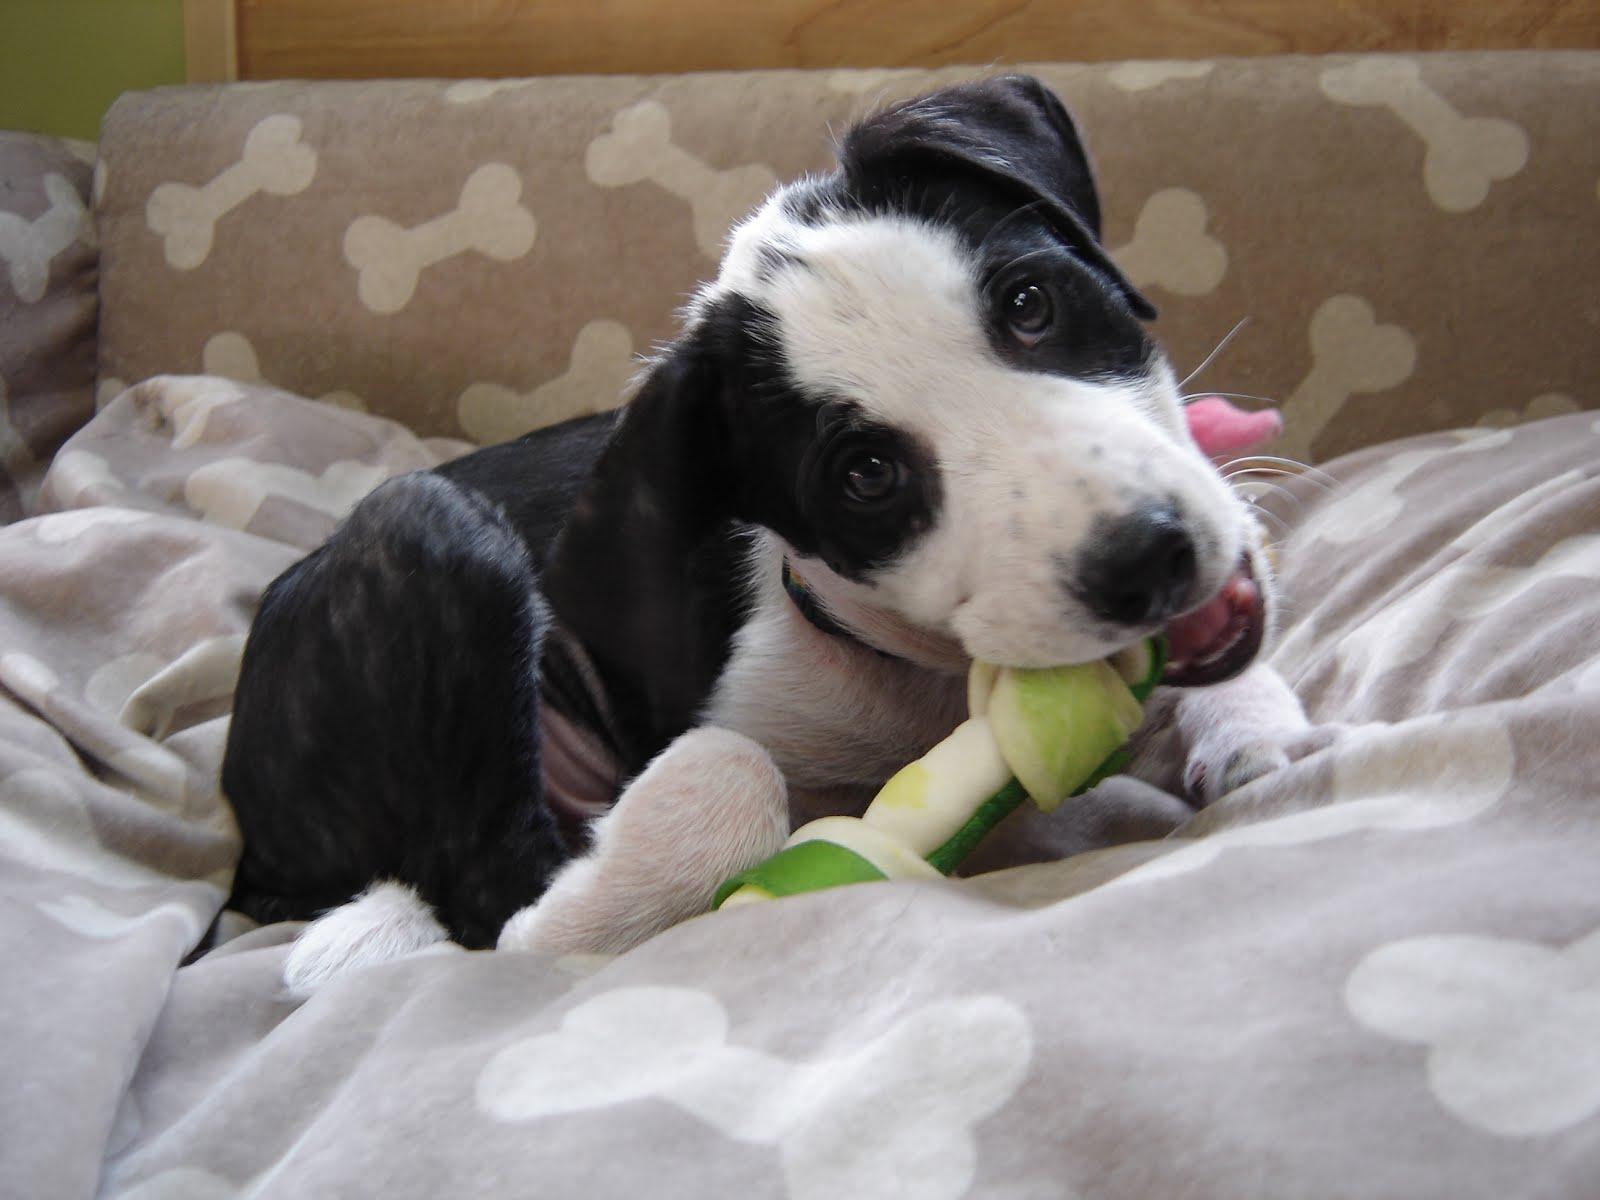 Beagle Dalmatian Mix | Dog Breeds Picture